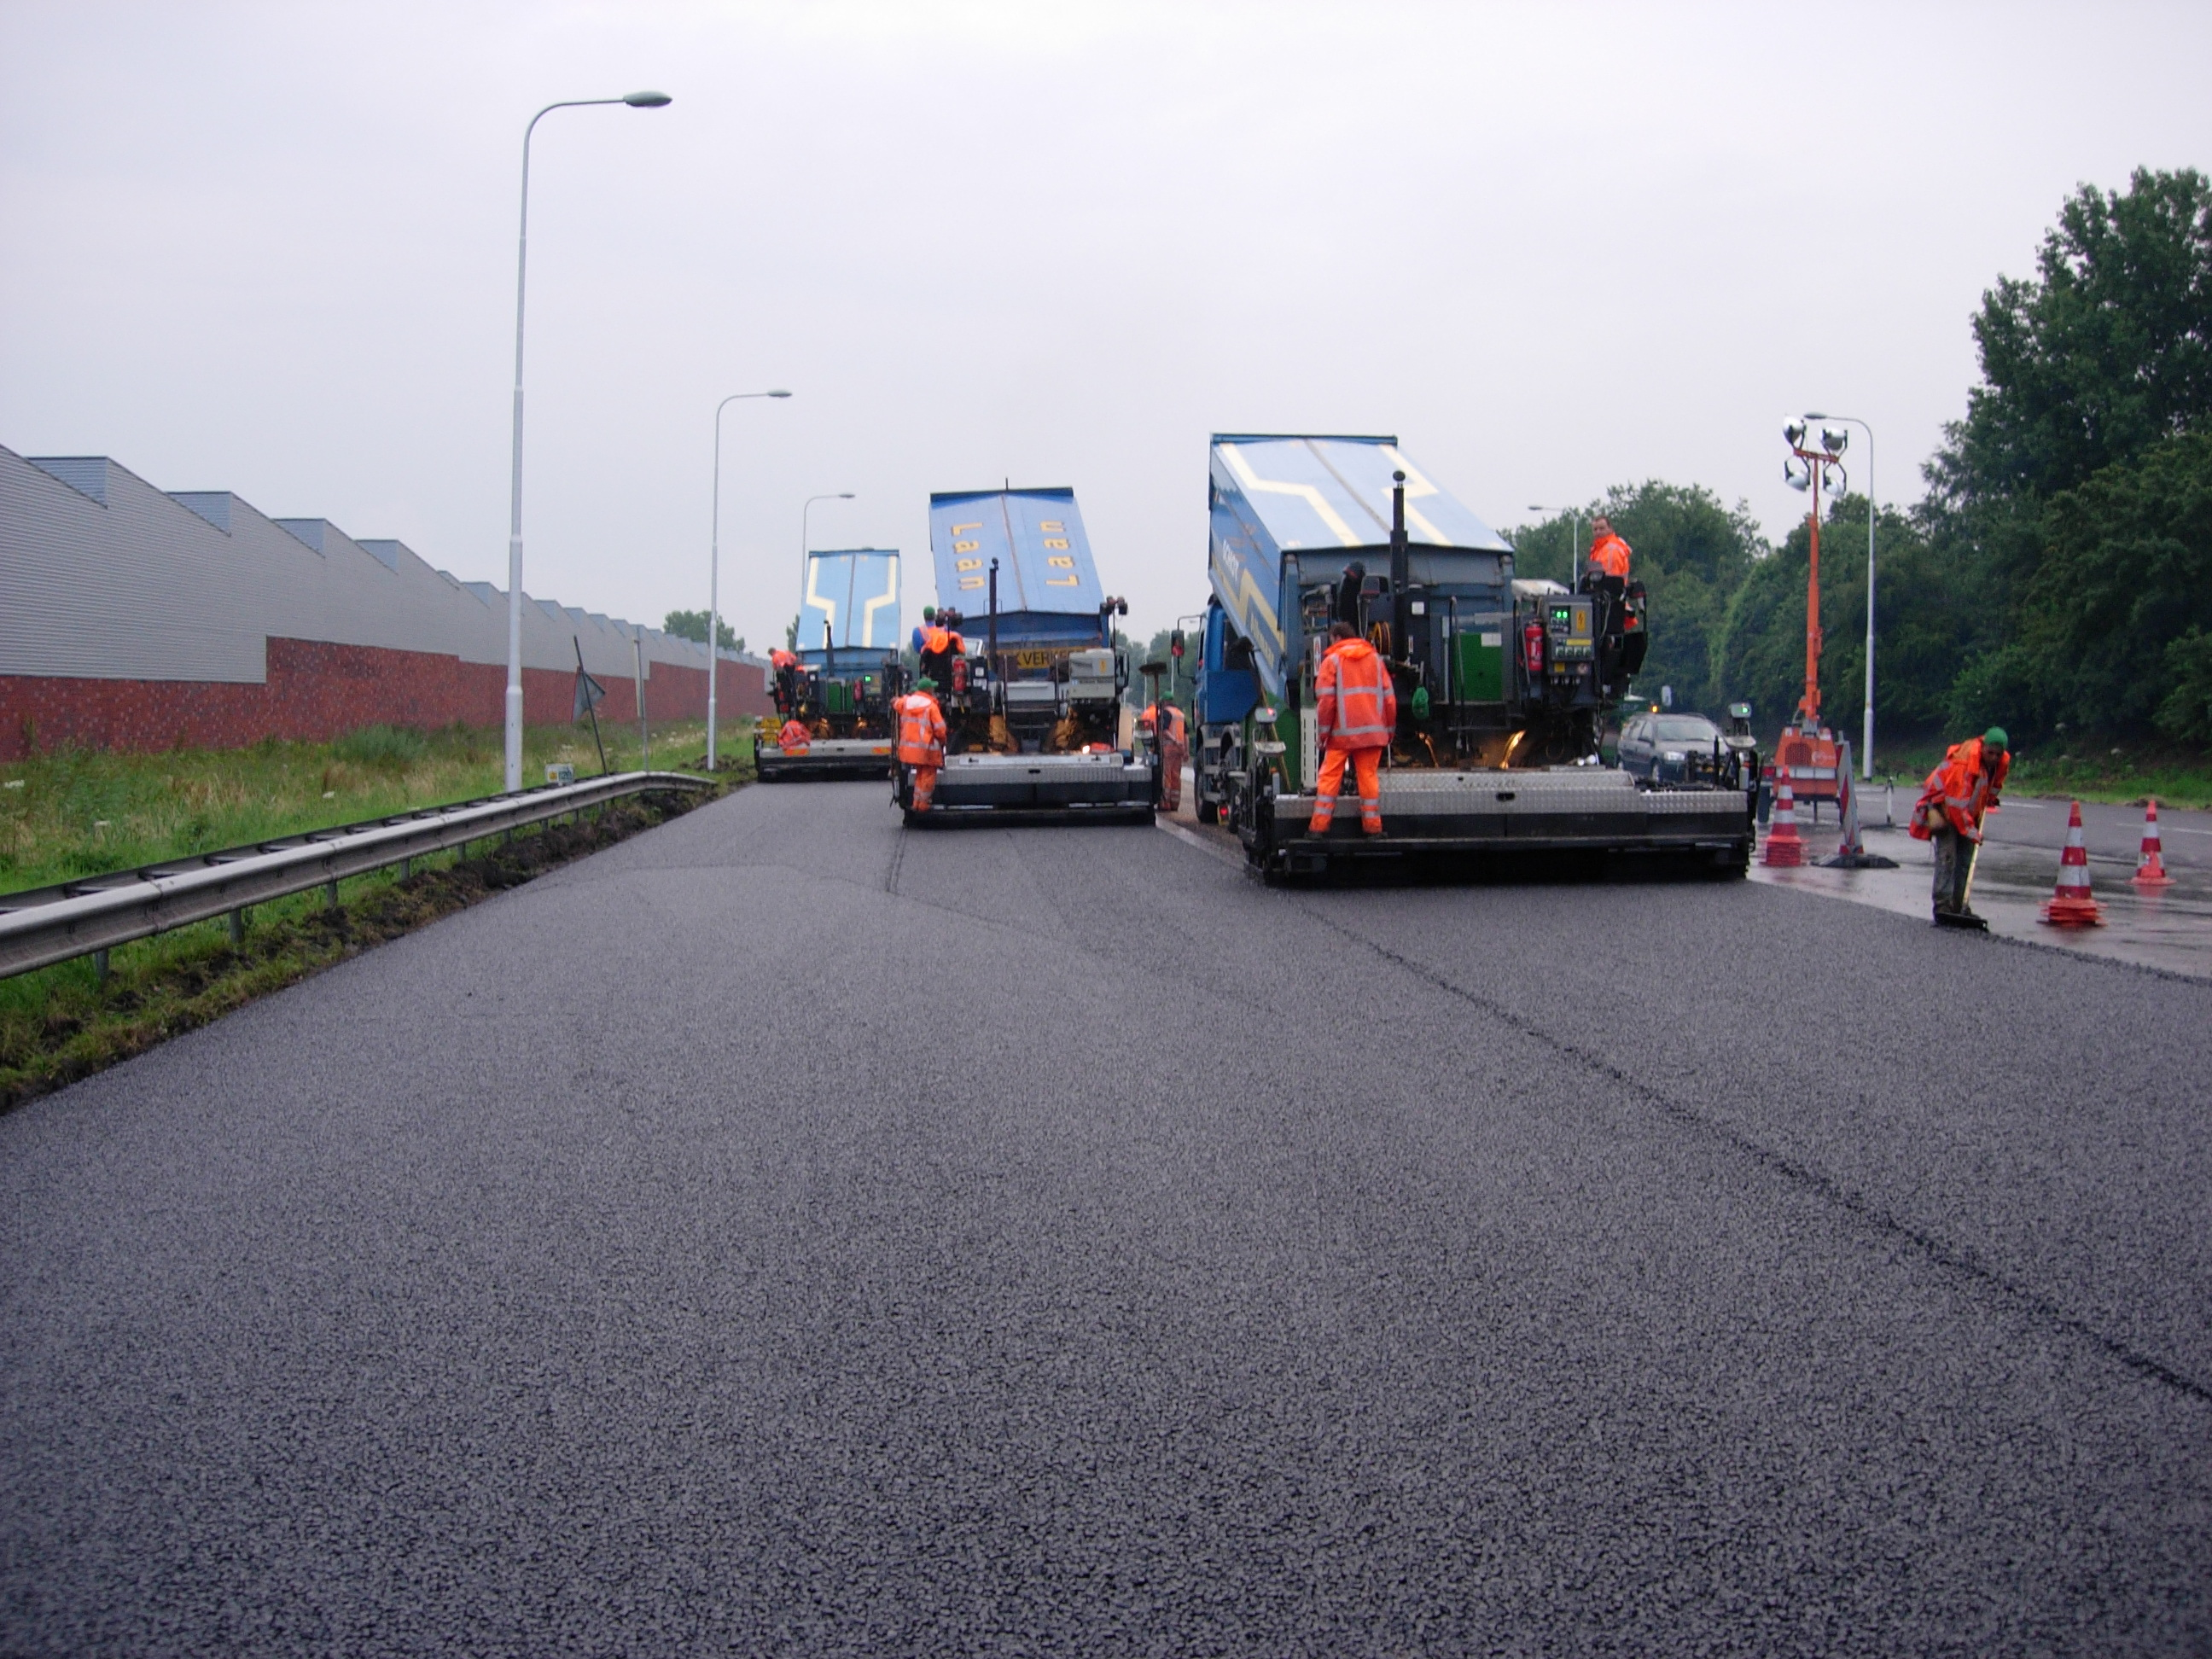 provincie noord-holland n245 asfalt